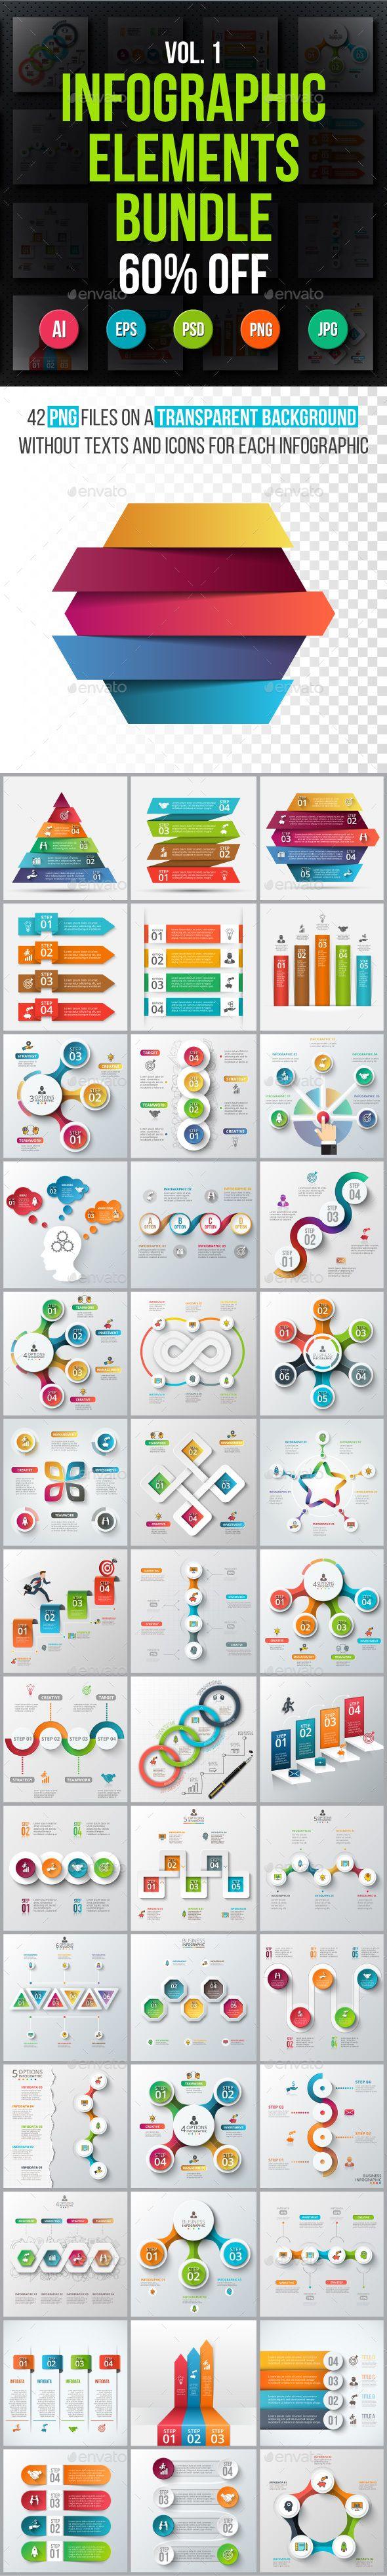 #Infographic elements bundle v.01 - Infographics Download here: https://graphicriver.net/item/infographic-elements-bundle-v01/19583976?ref=alena994